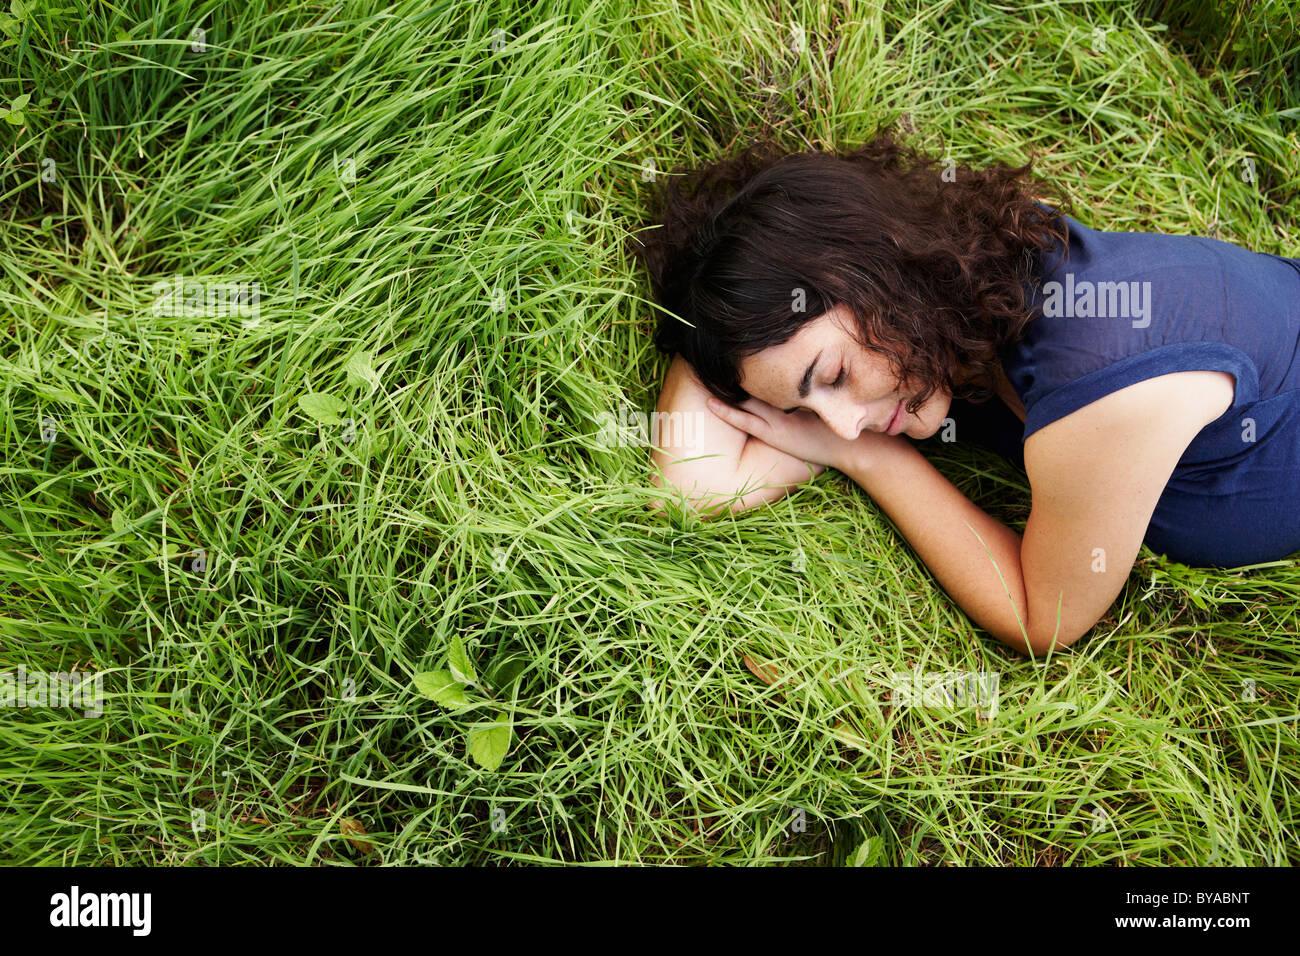 Woman sleeping in meadow - Stock Image